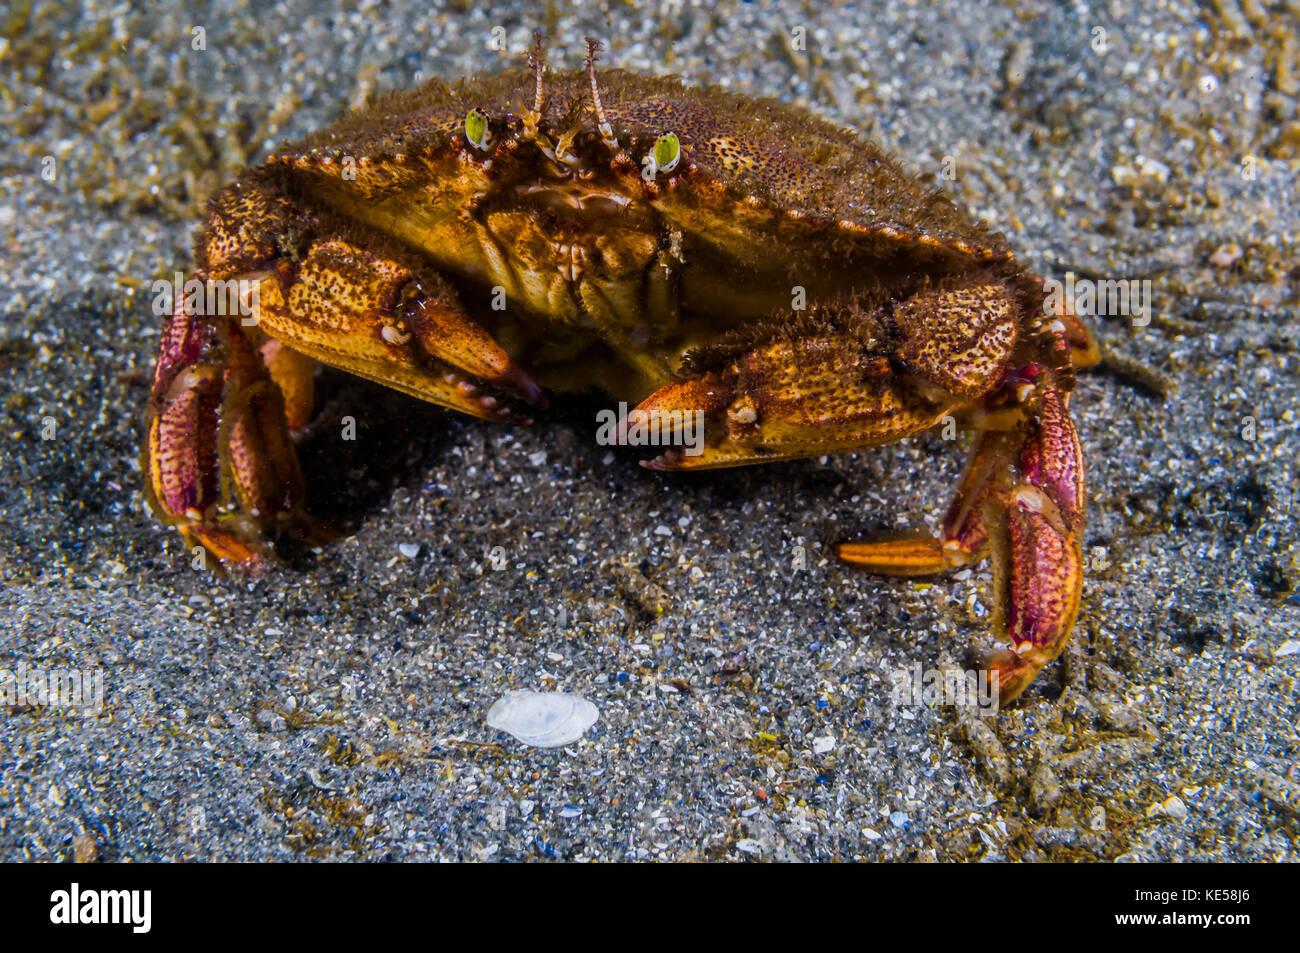 Atlantic rock crab, Maine. Stock Photo